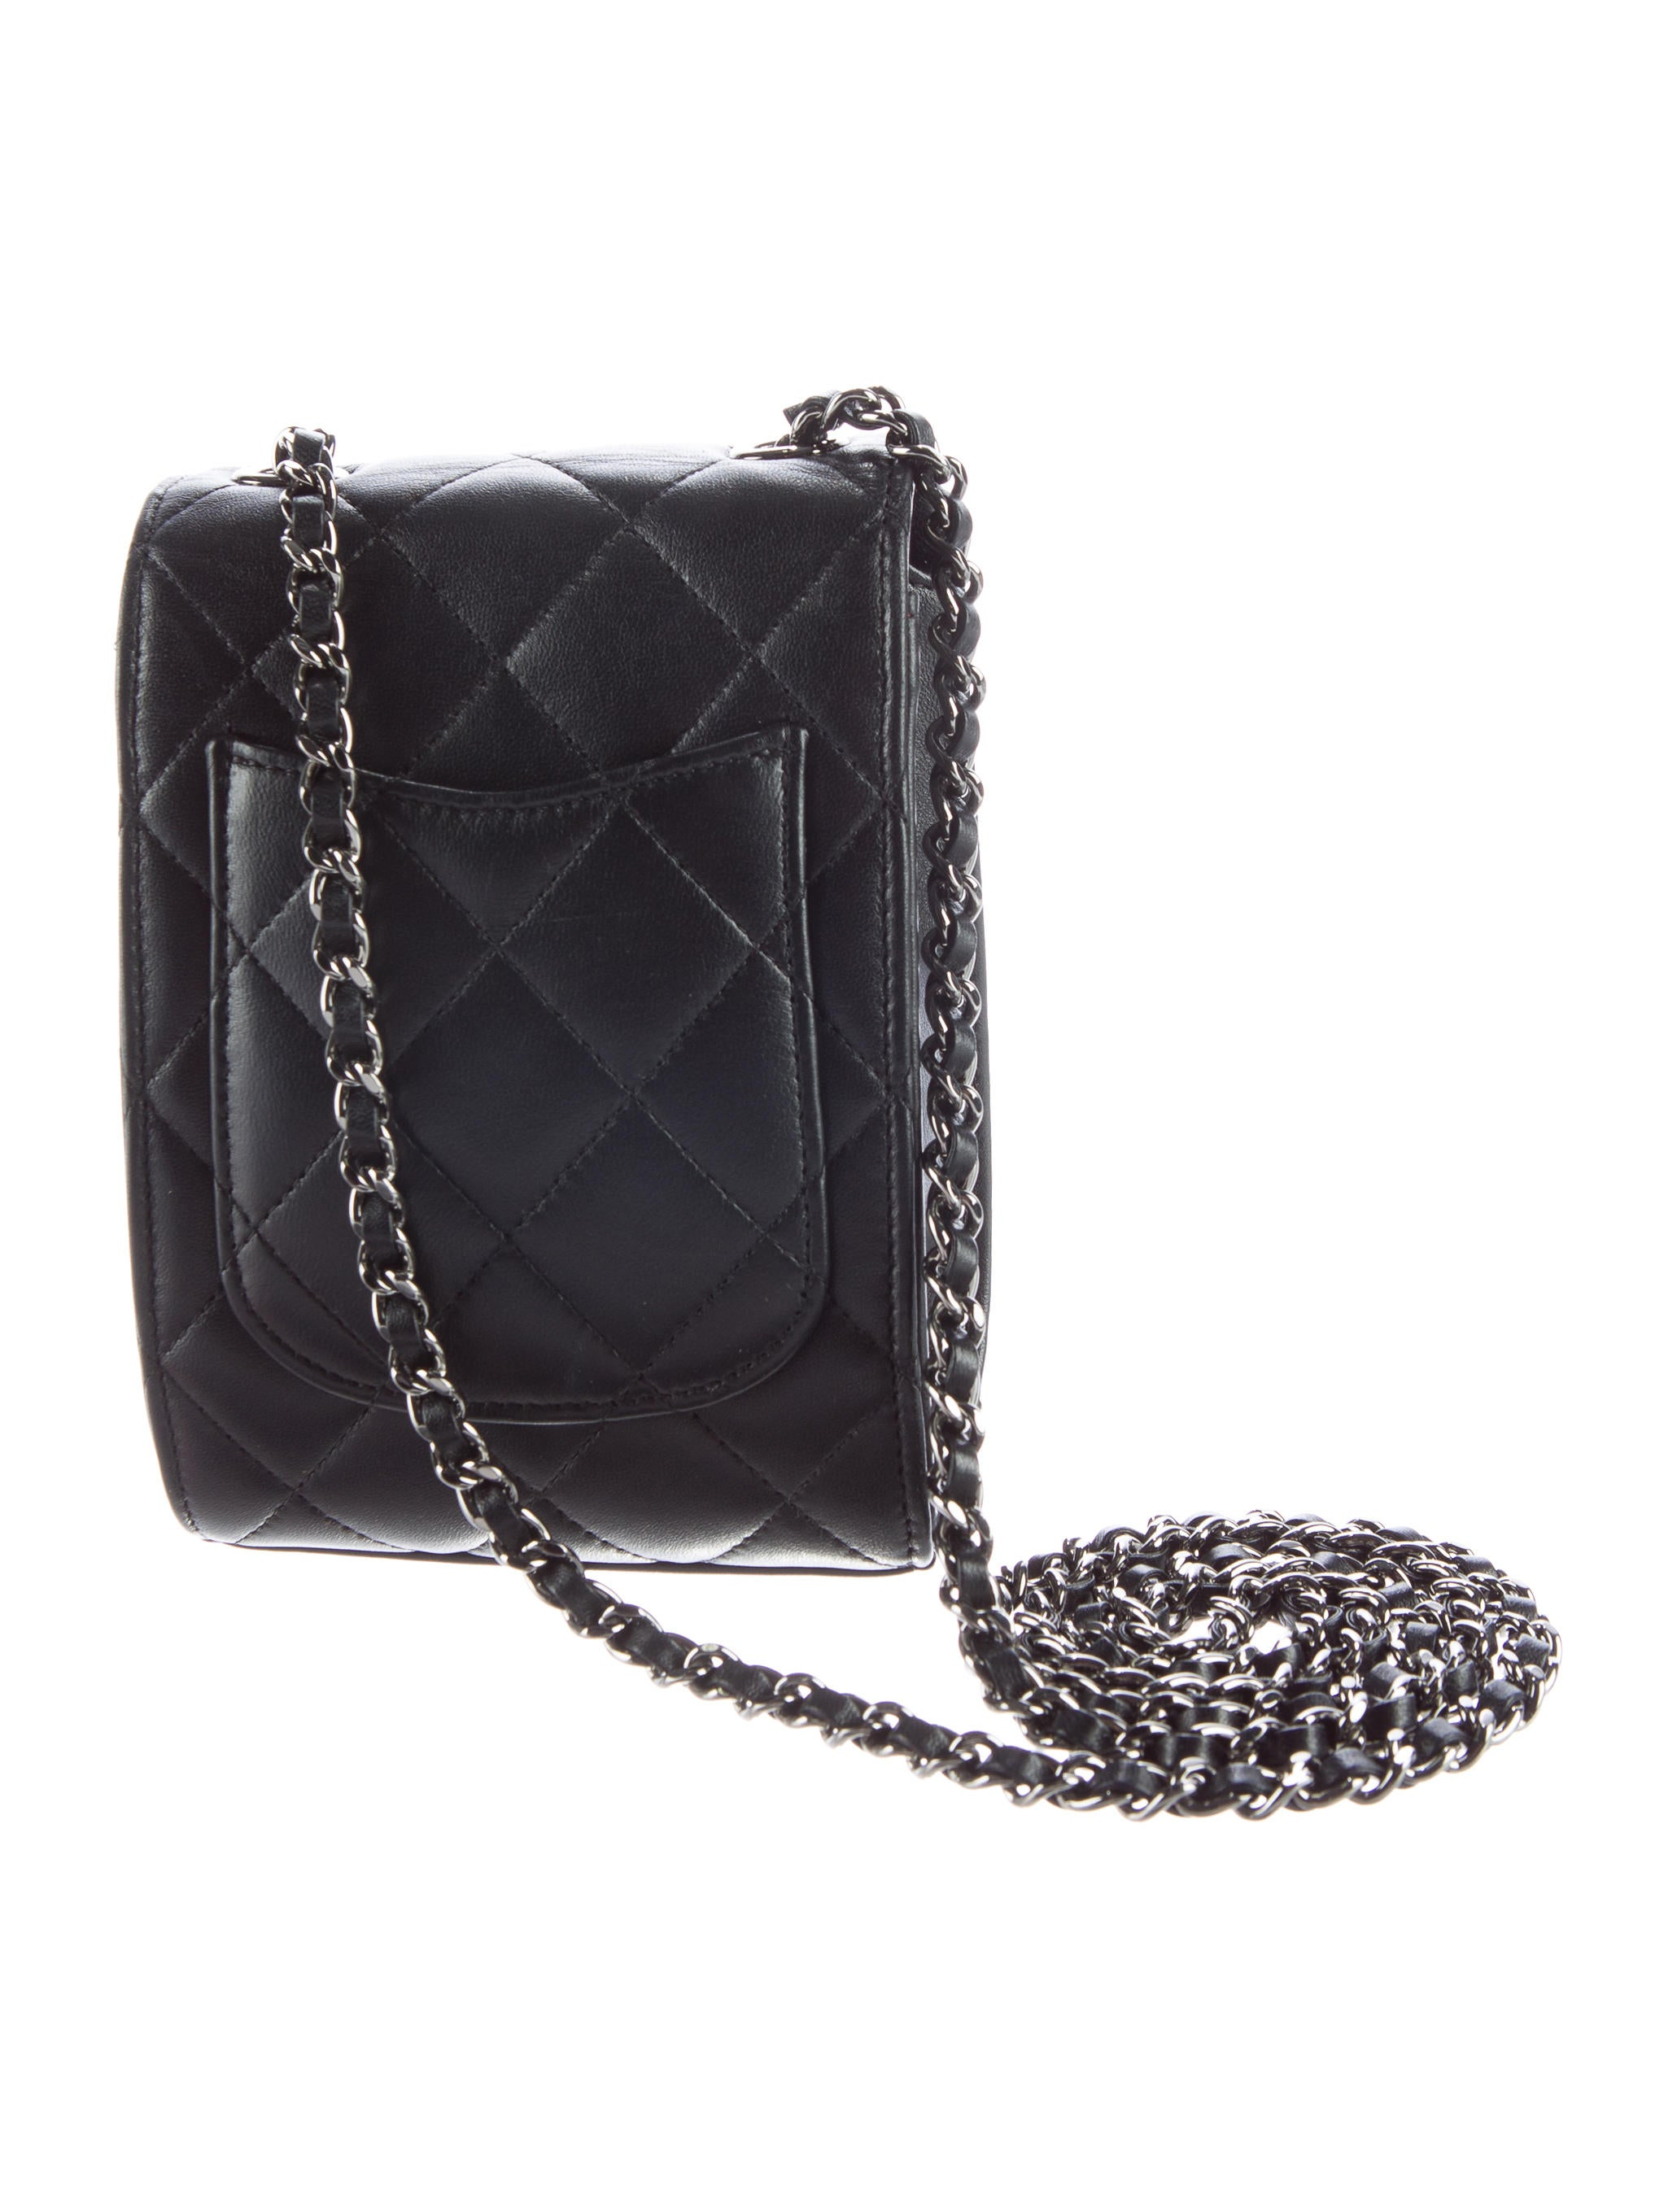 Chanel 2016 Quilted Mini Crossbody Bag Handbags